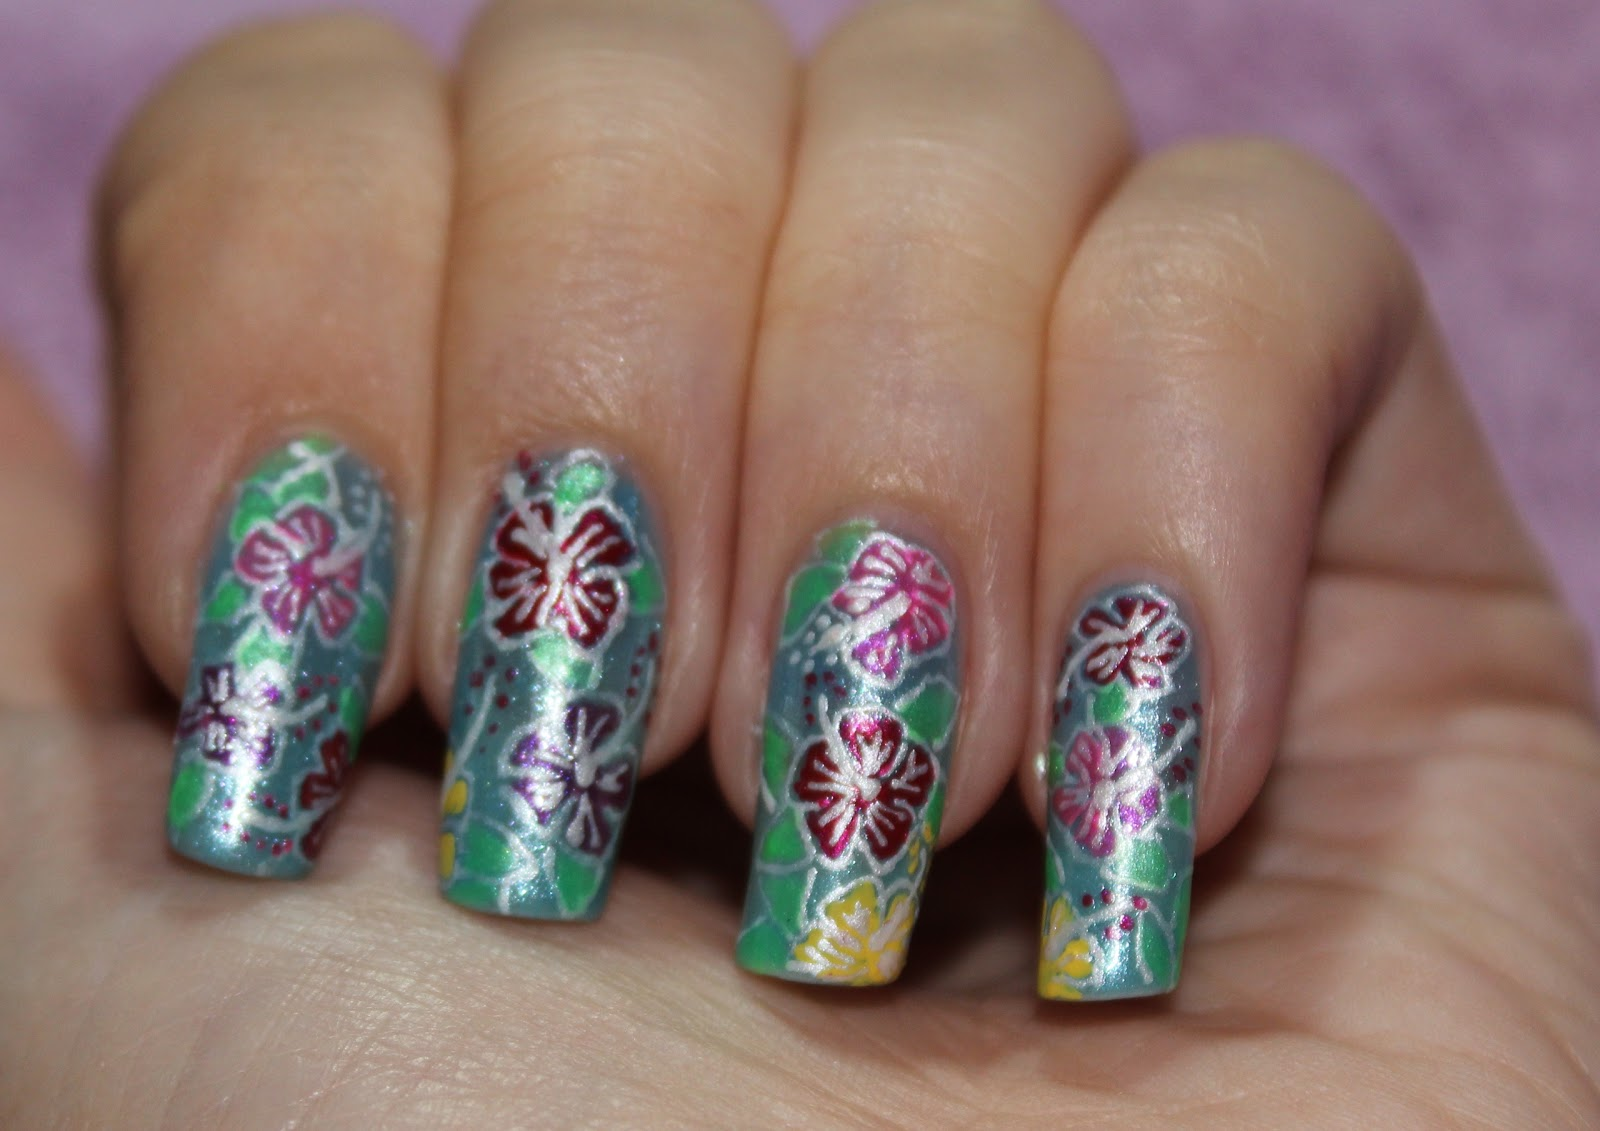 Nail Design Tutorials 2012 Nail Design Hibiscus Flowers Nail Art